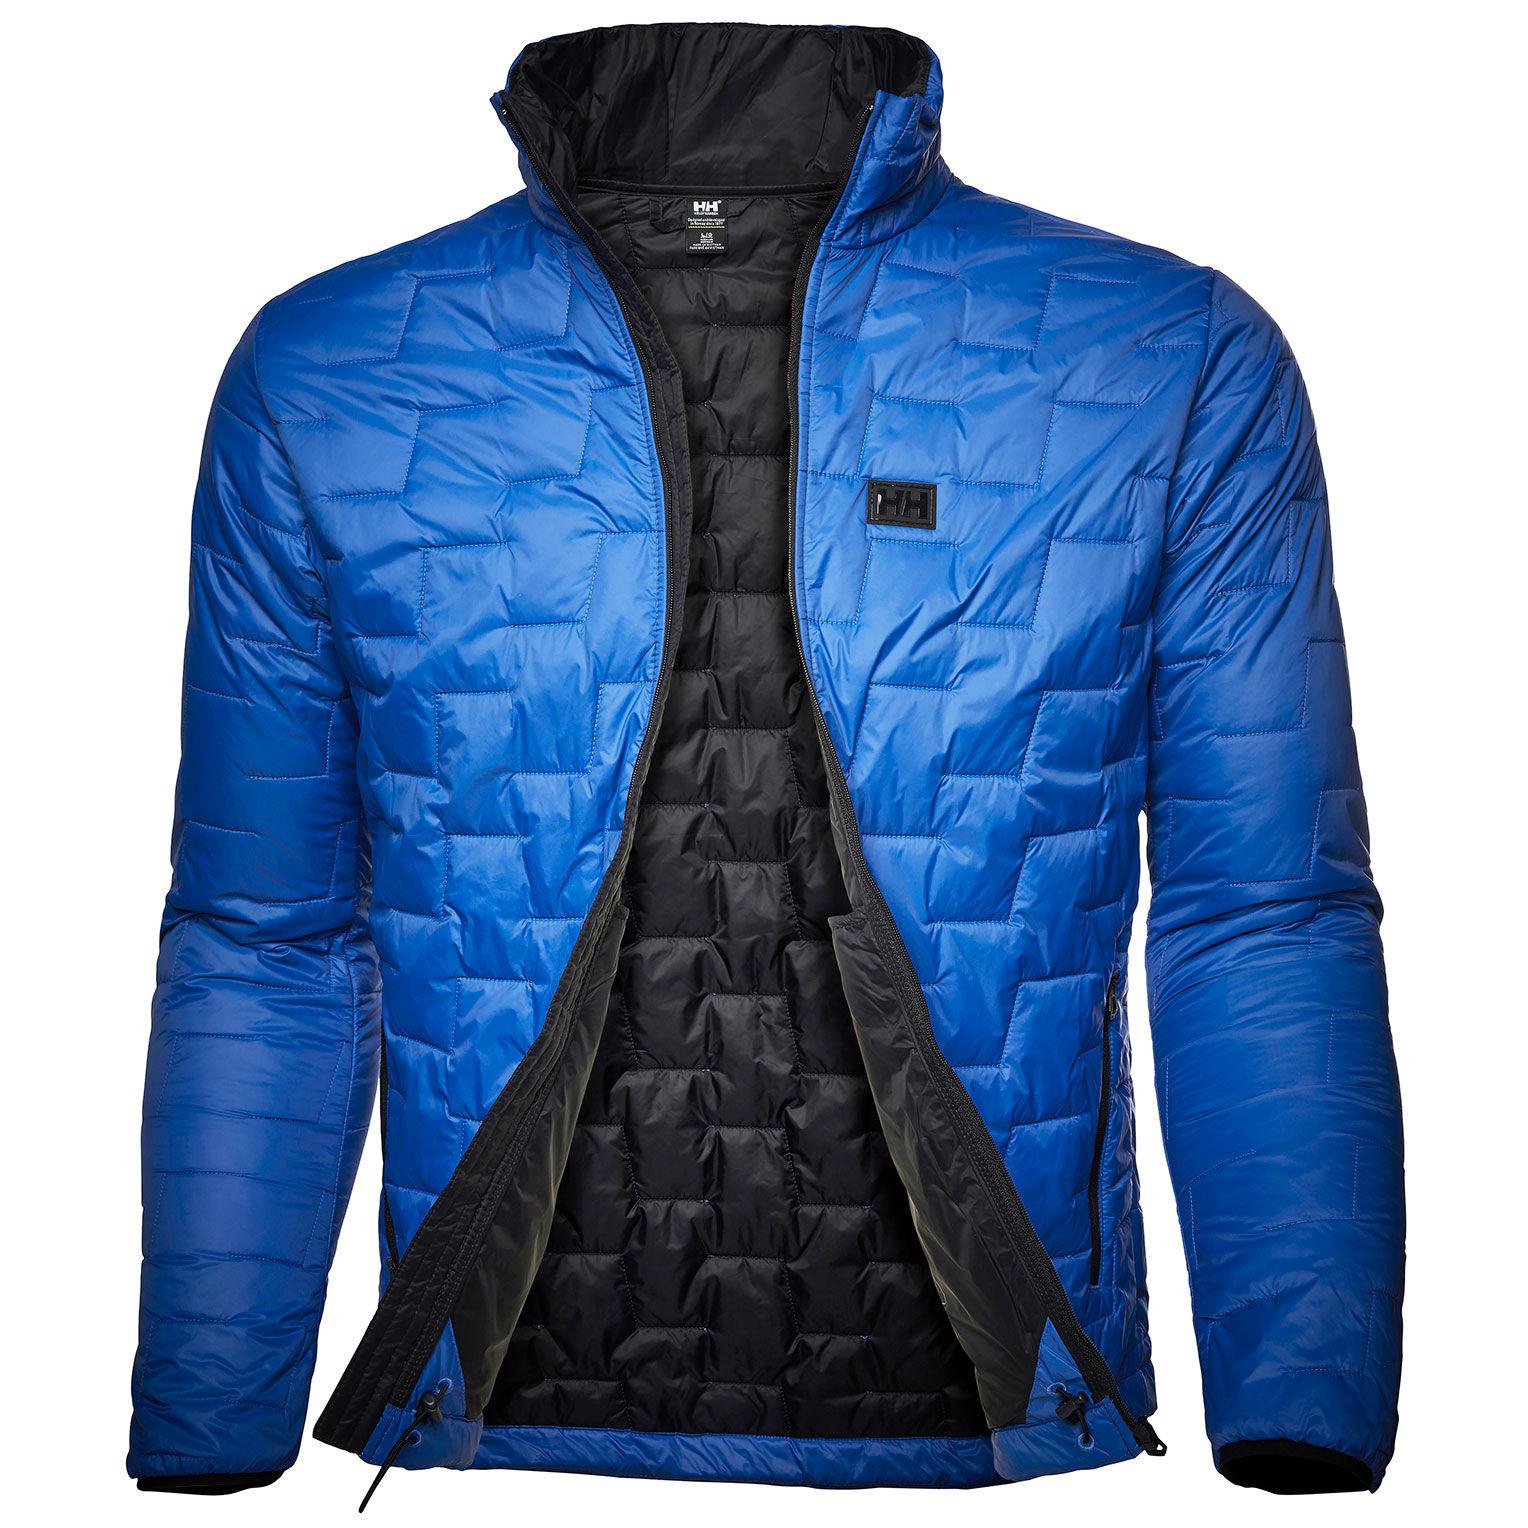 Comprar Helly Hansen Chaqueta Lifaloft Insulator azul / PrimaLoft® / Lifaloft